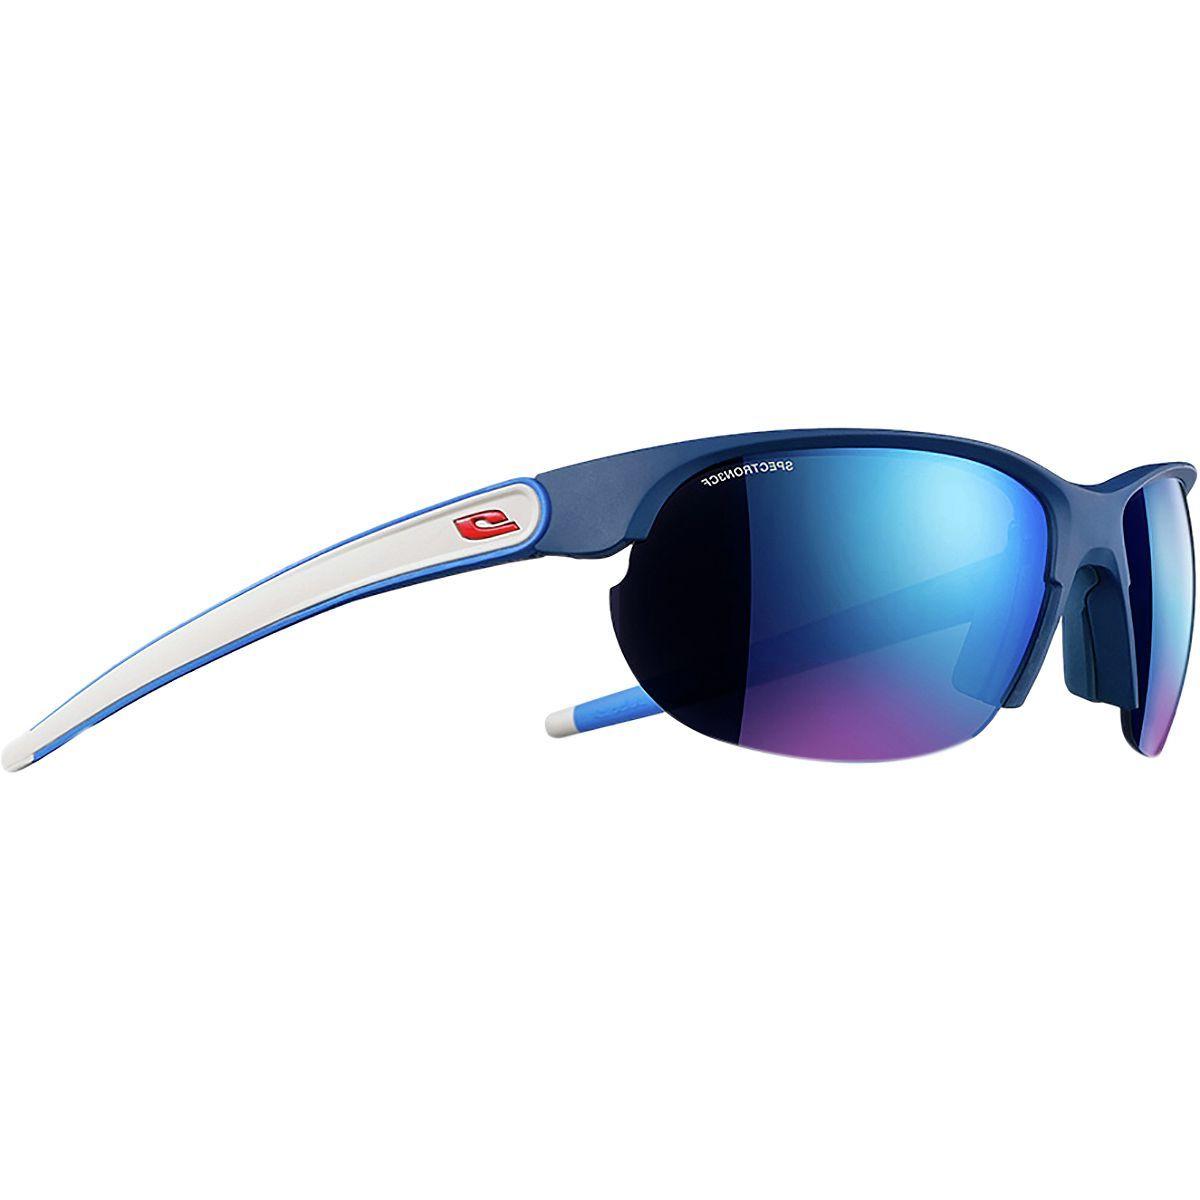 Julbo Breeze Spectron 3 CF Sunglasses - Women's